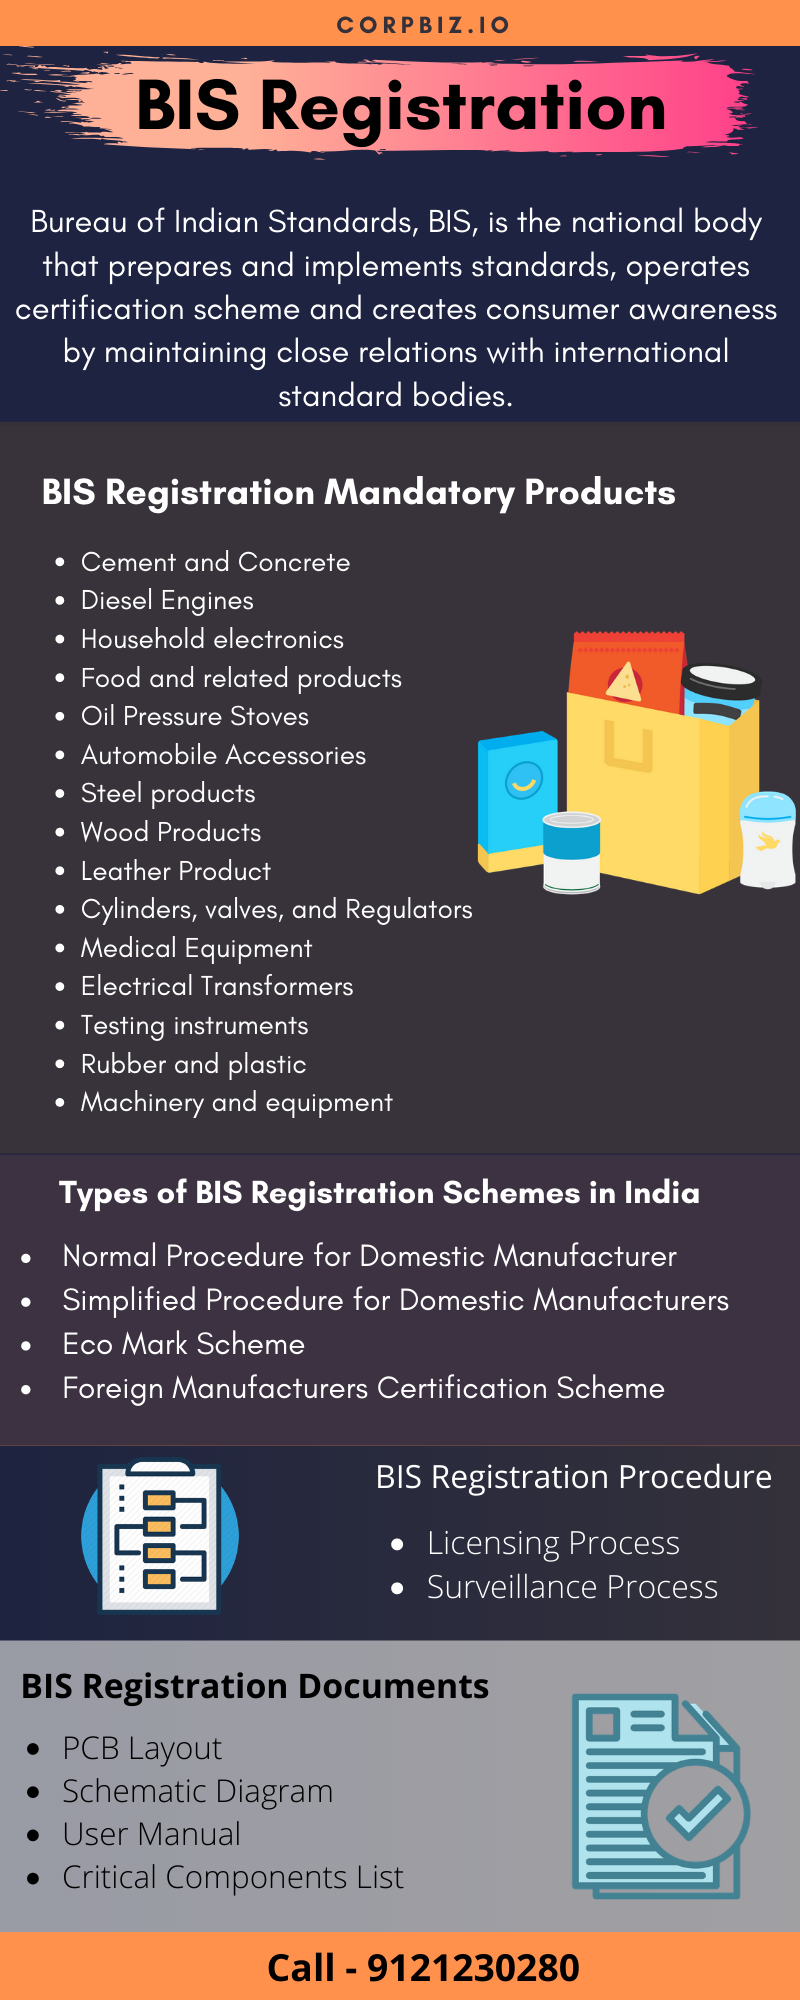 Online Bis Registration In India Corpbiz In 2020 Registration Certificate Legal Services